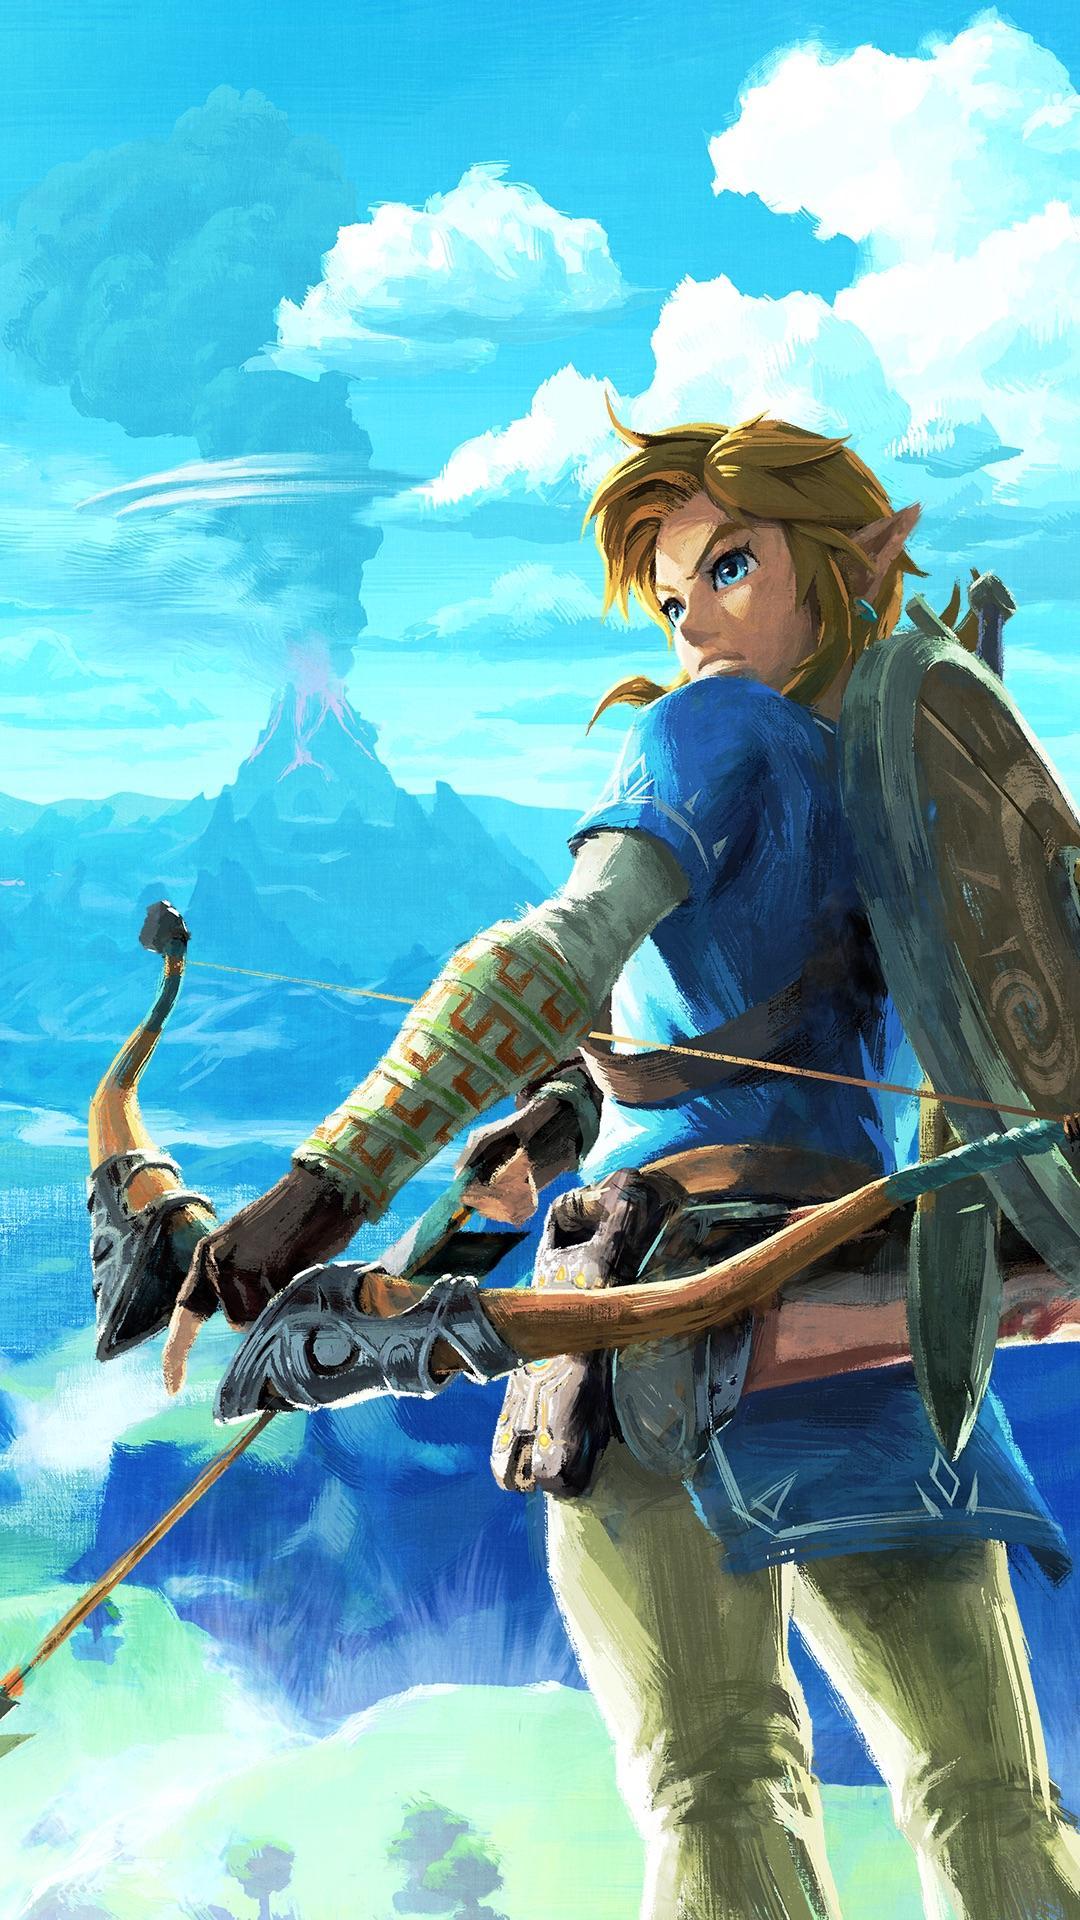 Zelda Breath Of The Wild Hd Wallpaper - Legend Of Zelda Breath Of The Wild Link Poster , HD Wallpaper & Backgrounds